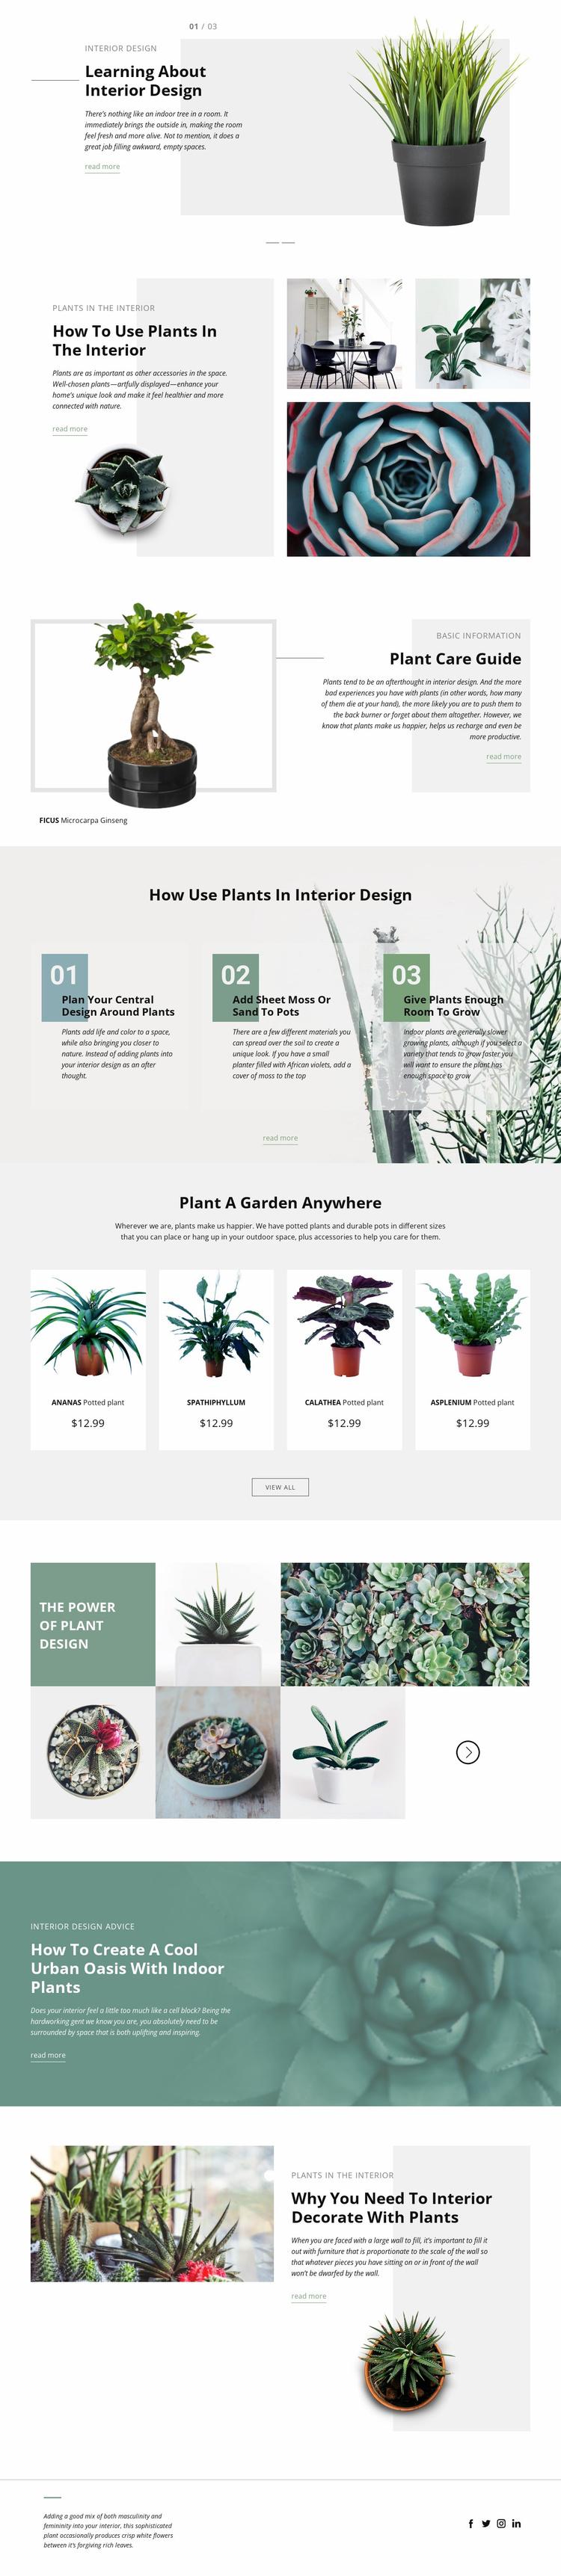 Interior Design Studio Website Template